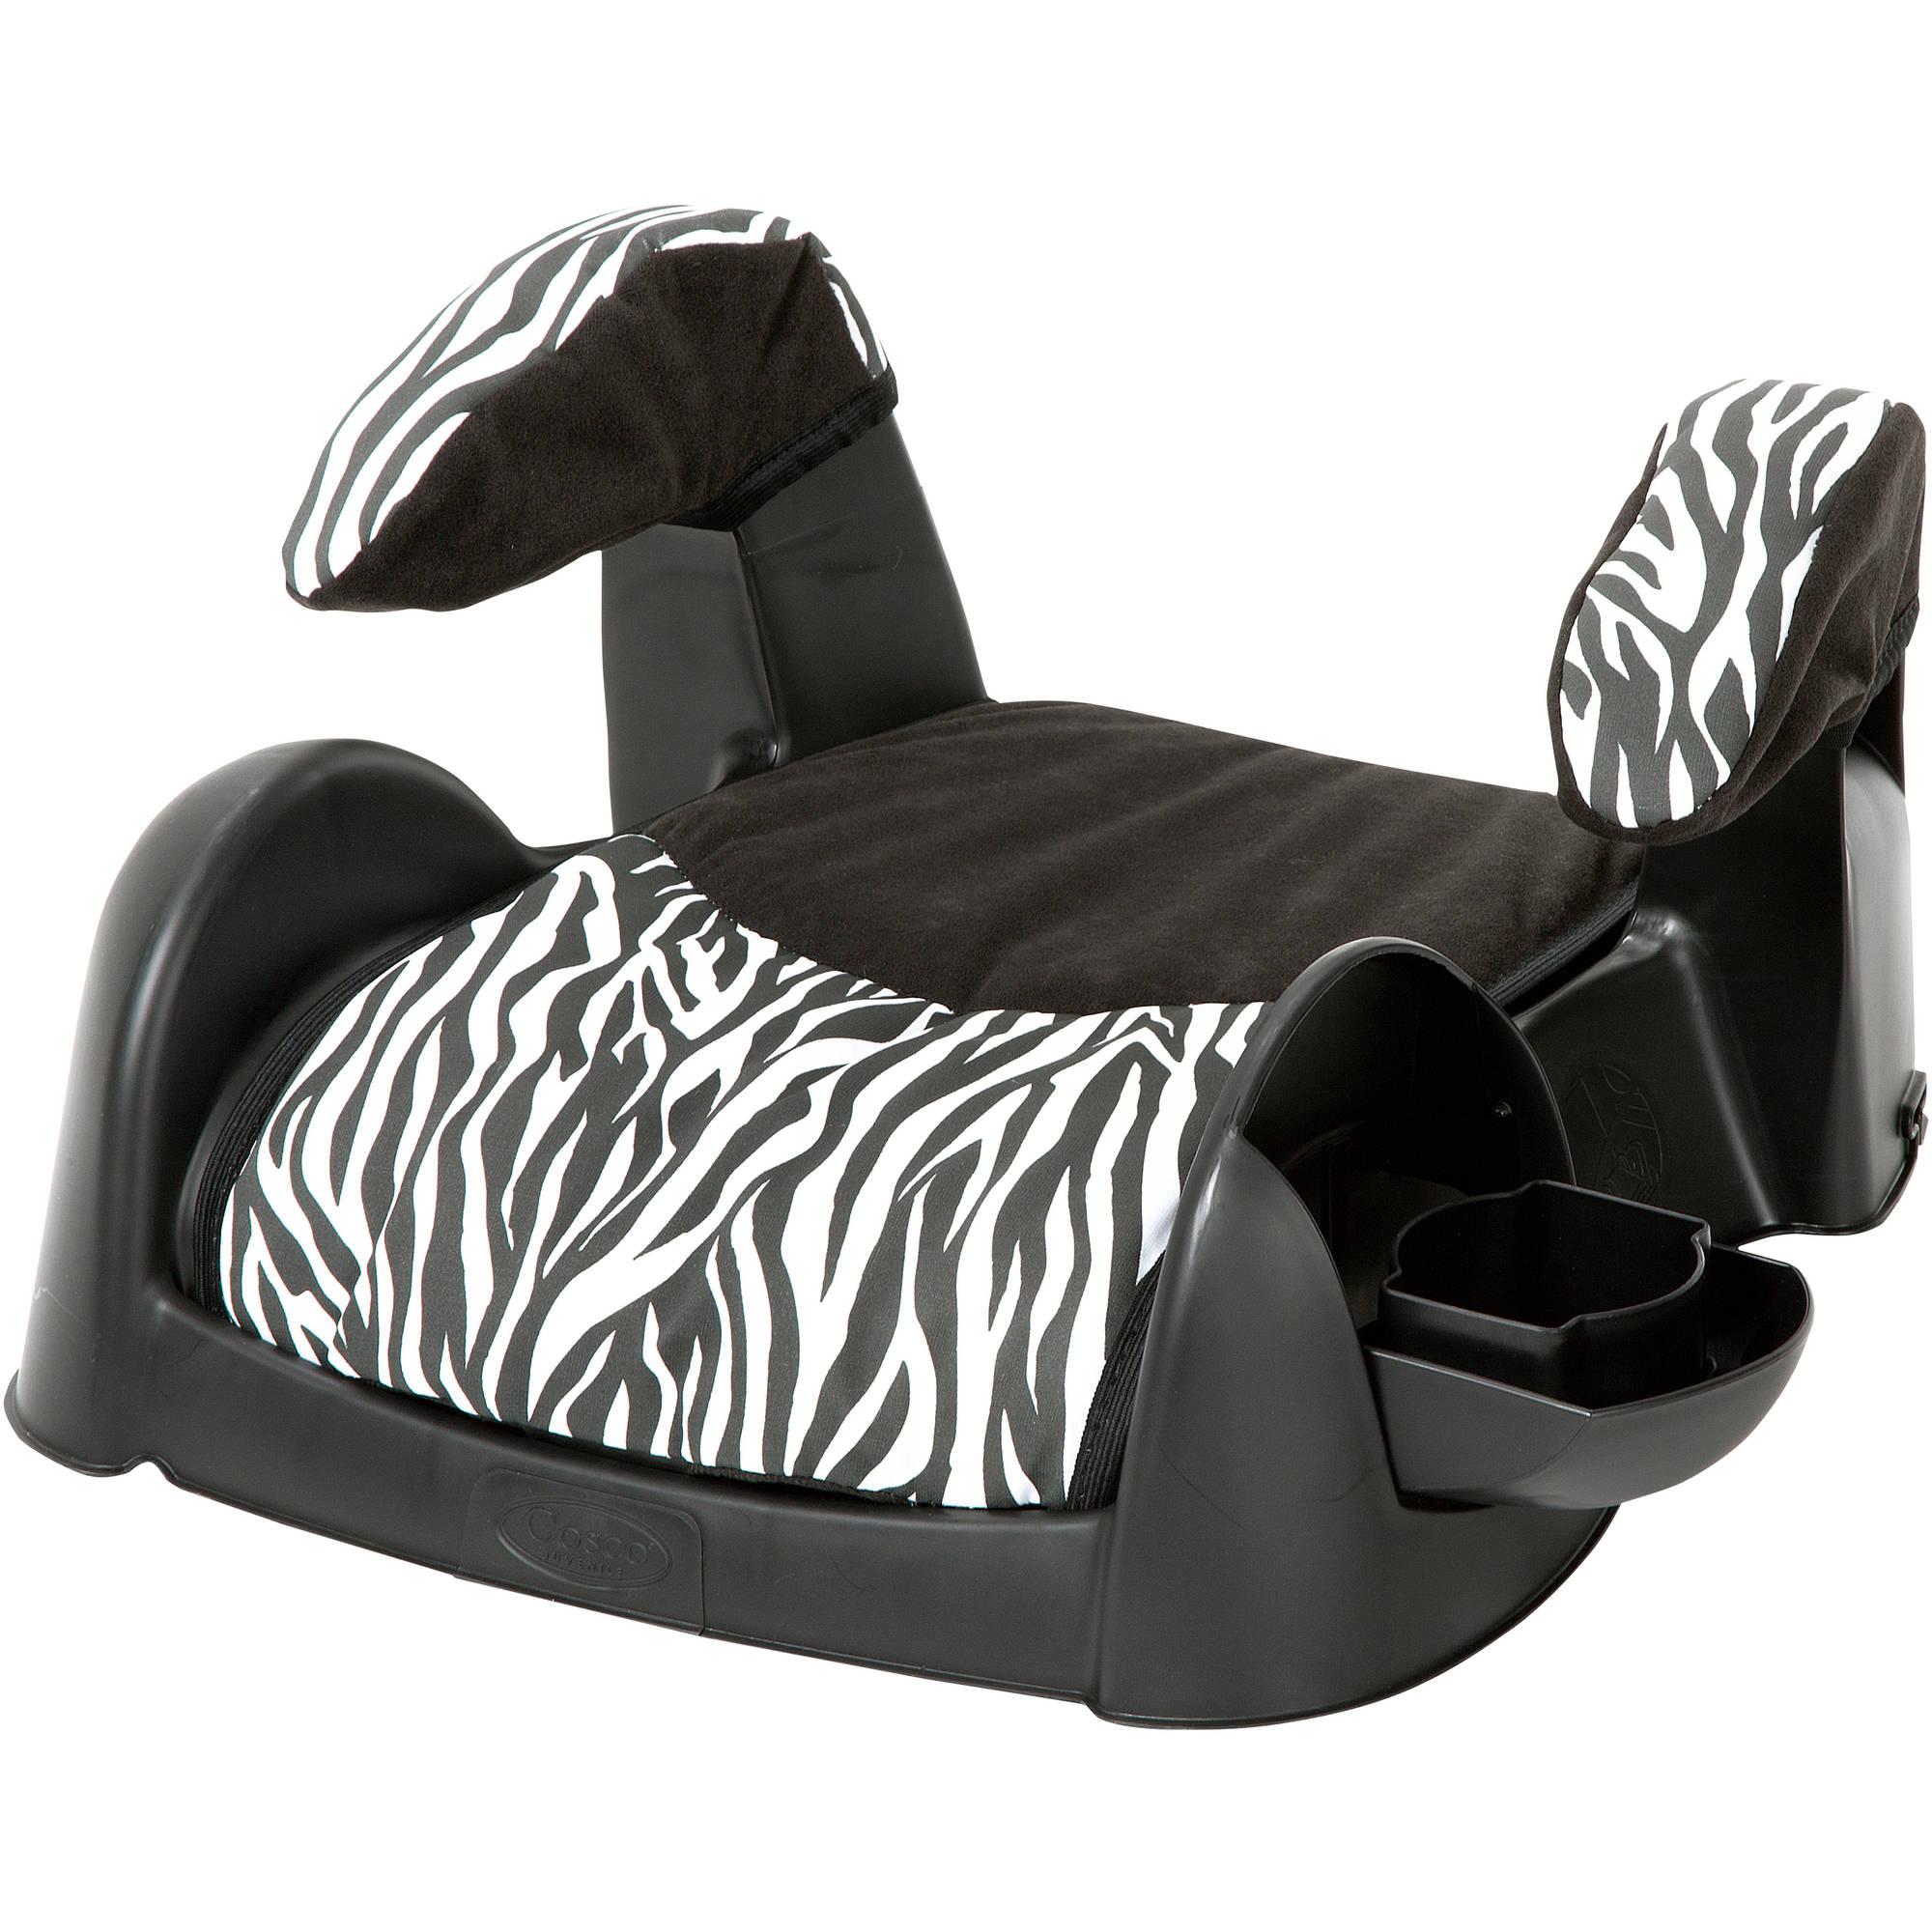 Cosco Ambassador Booster Car Seat, Zahari